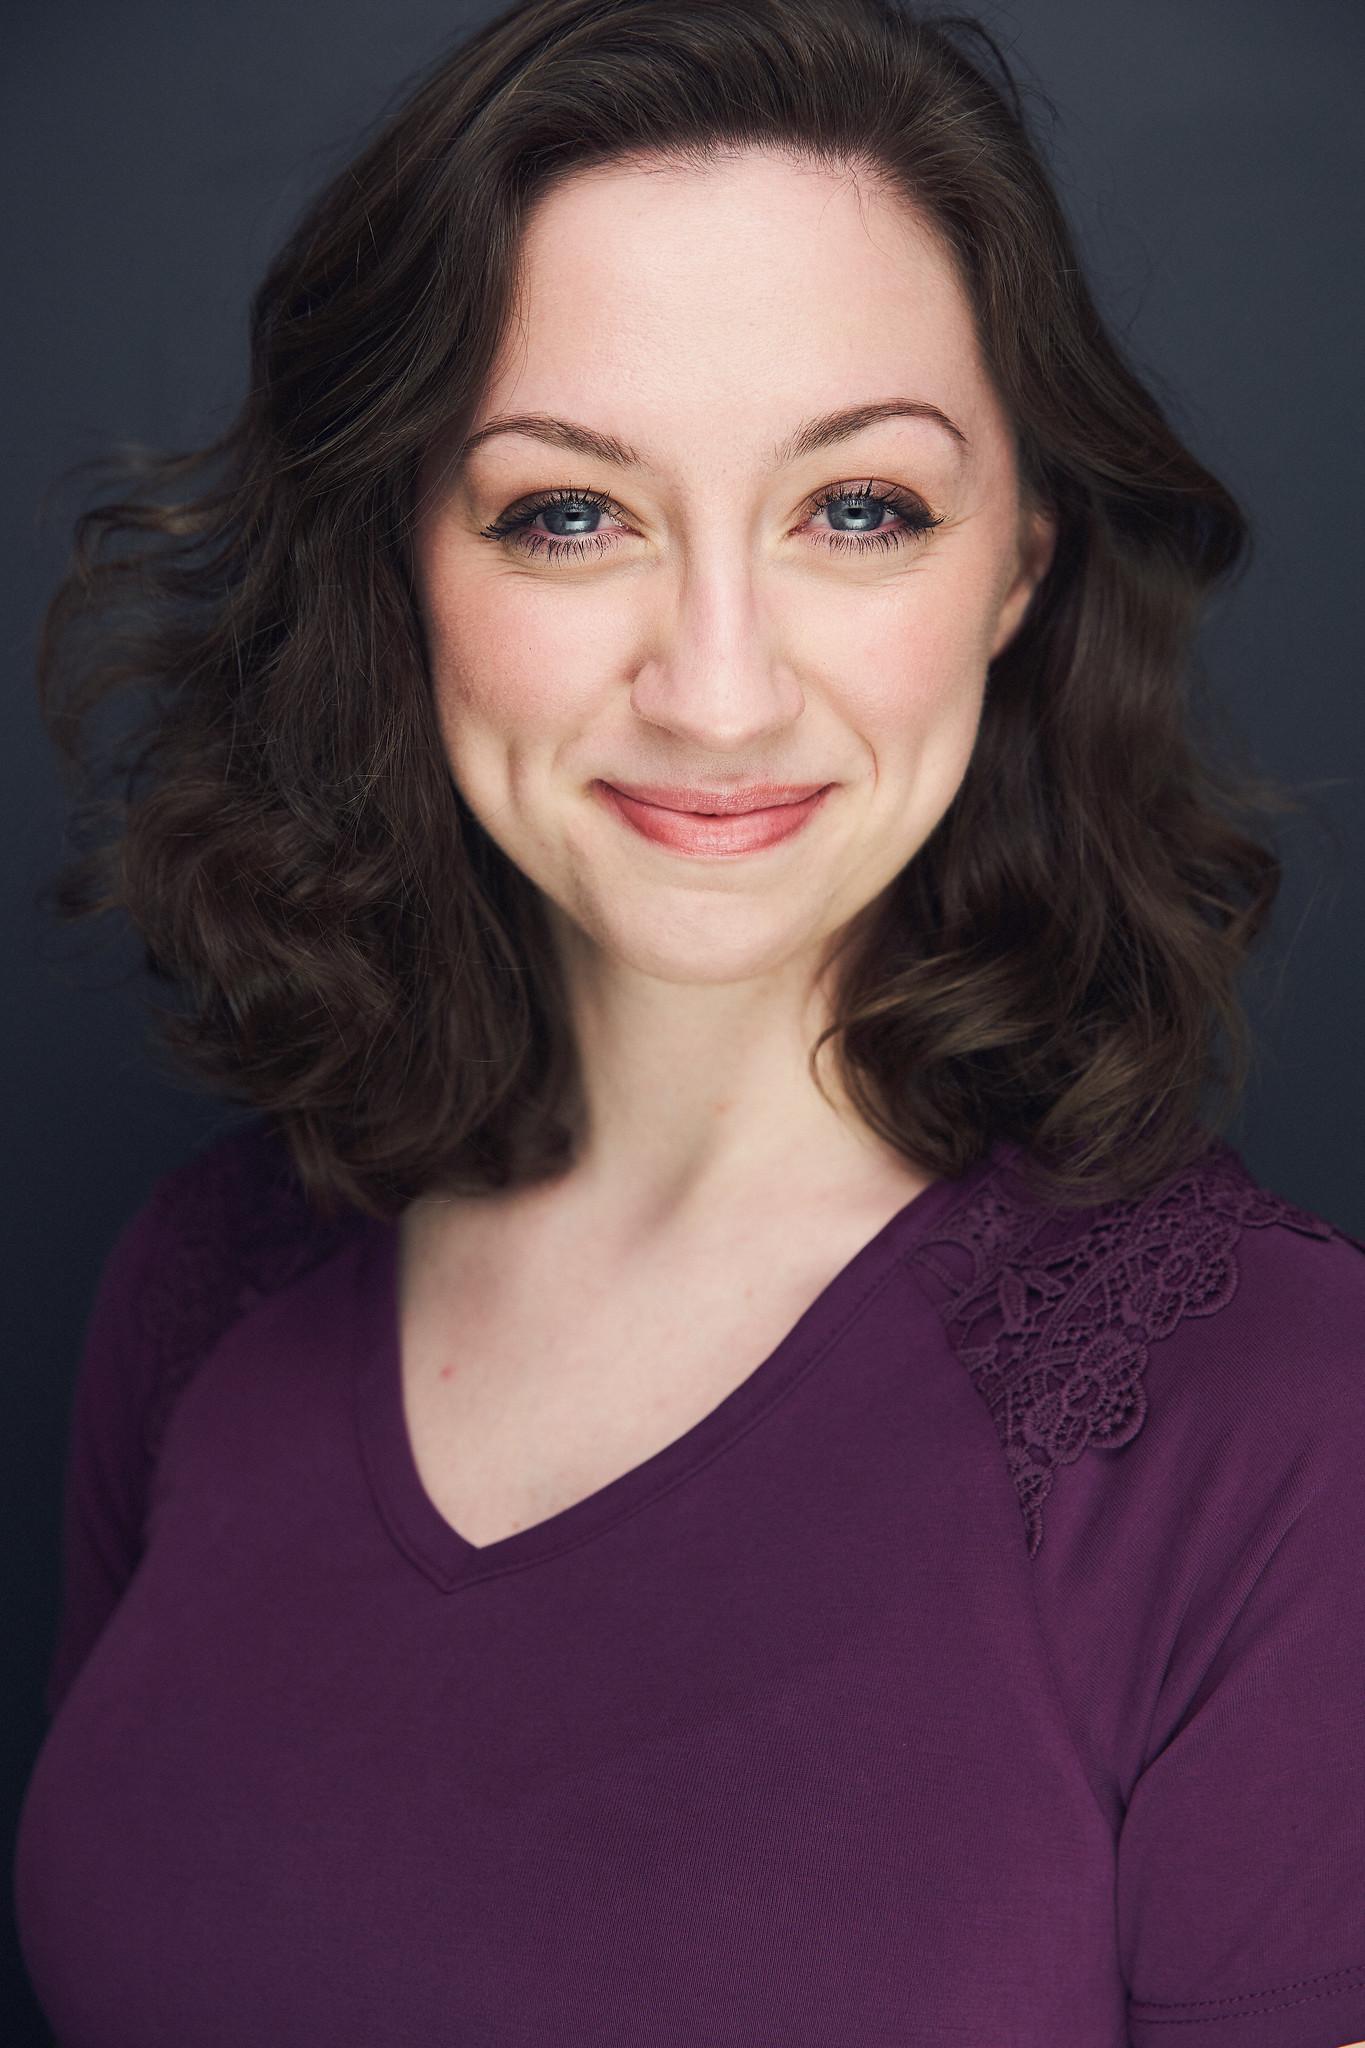 Samantha Resnick